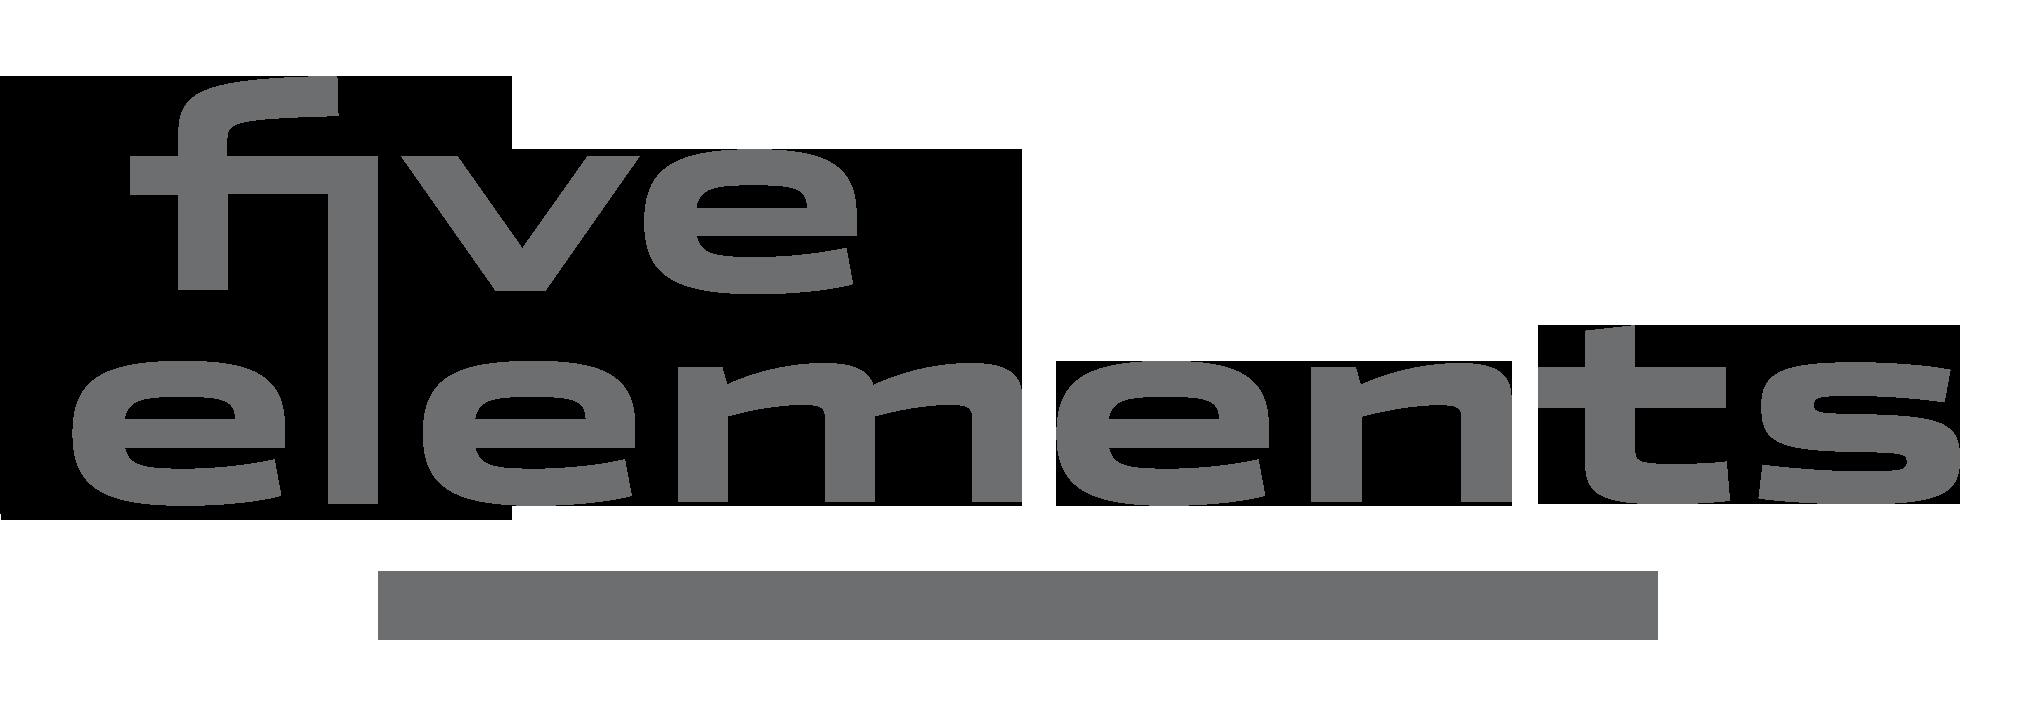 Five elements backpacker hostels. Hotel clipart hostel building